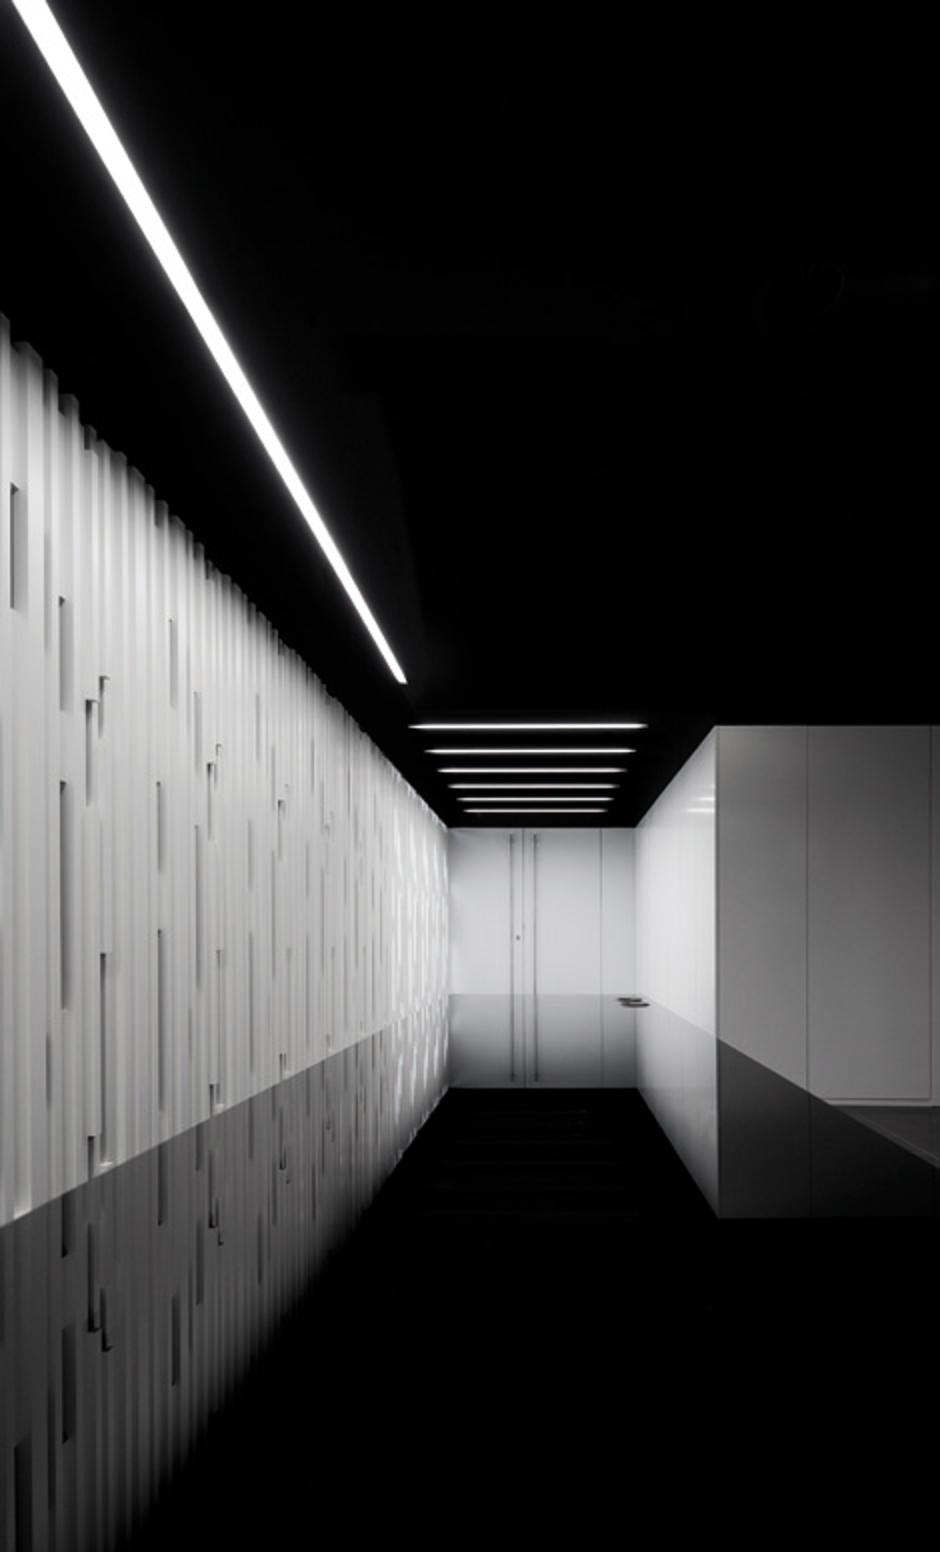 Interior de hotel con perfil de extrusion de aluminio de estudio discoh design para arkoslight luz